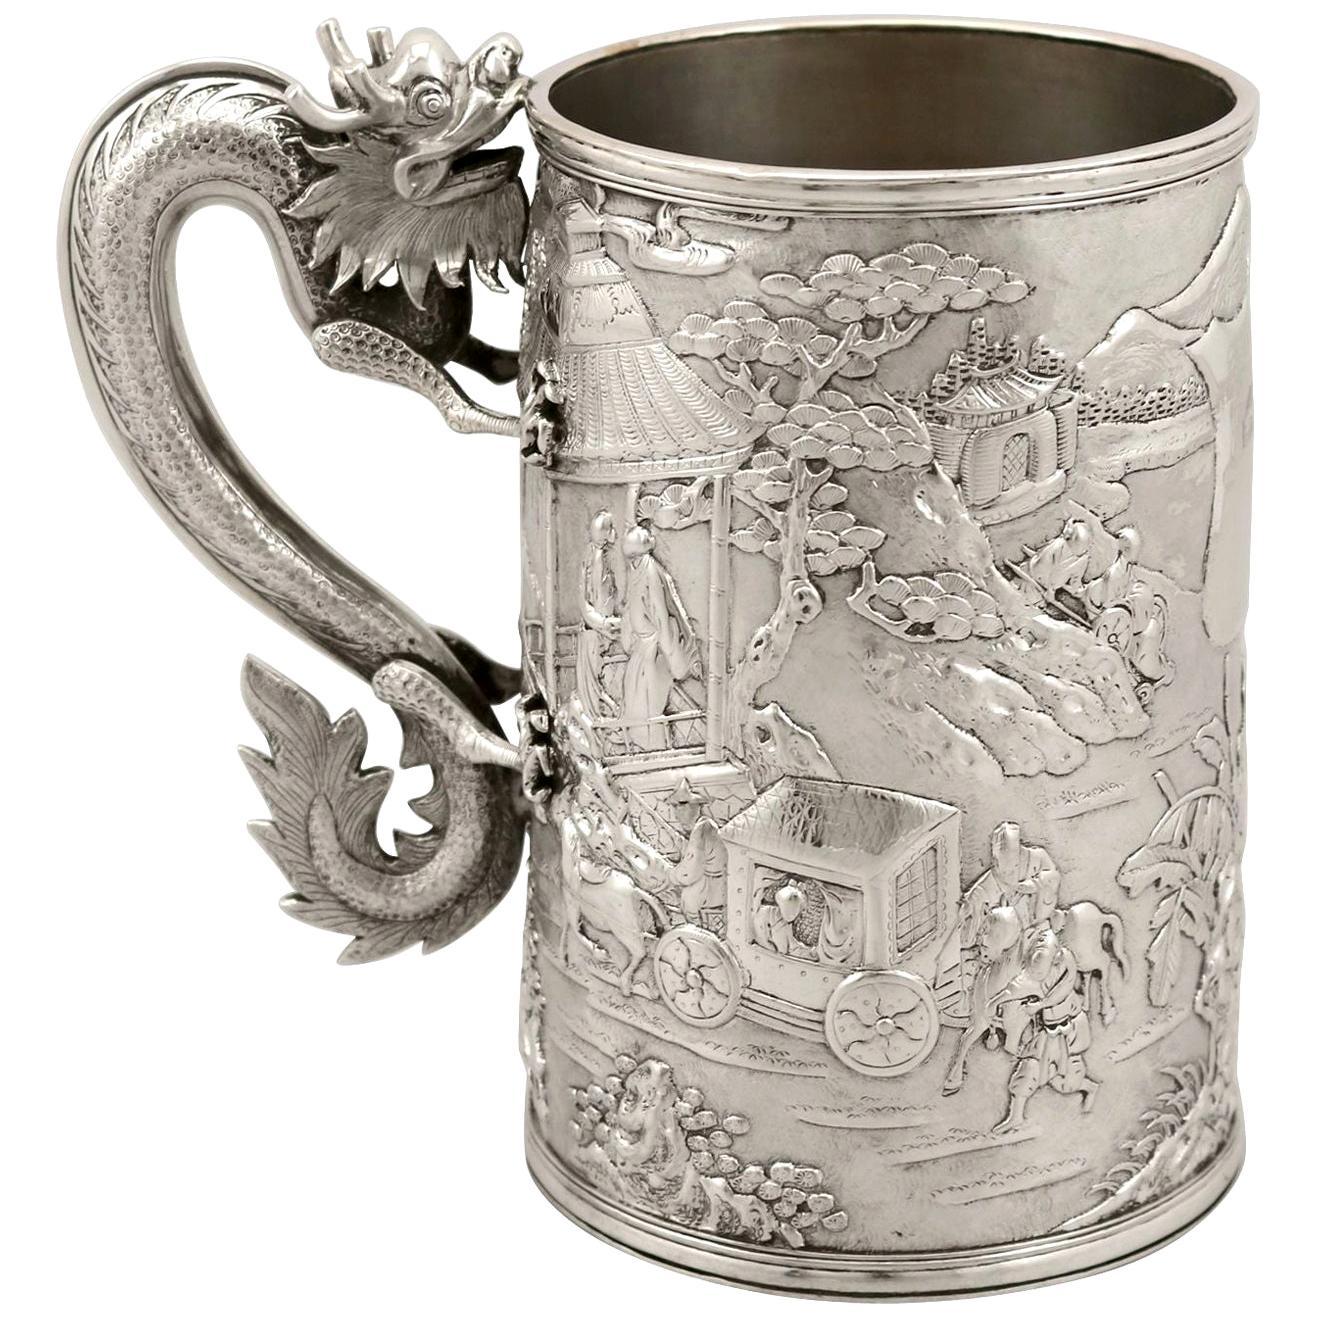 Chinese Export Silver Mug Antique Circa 1900